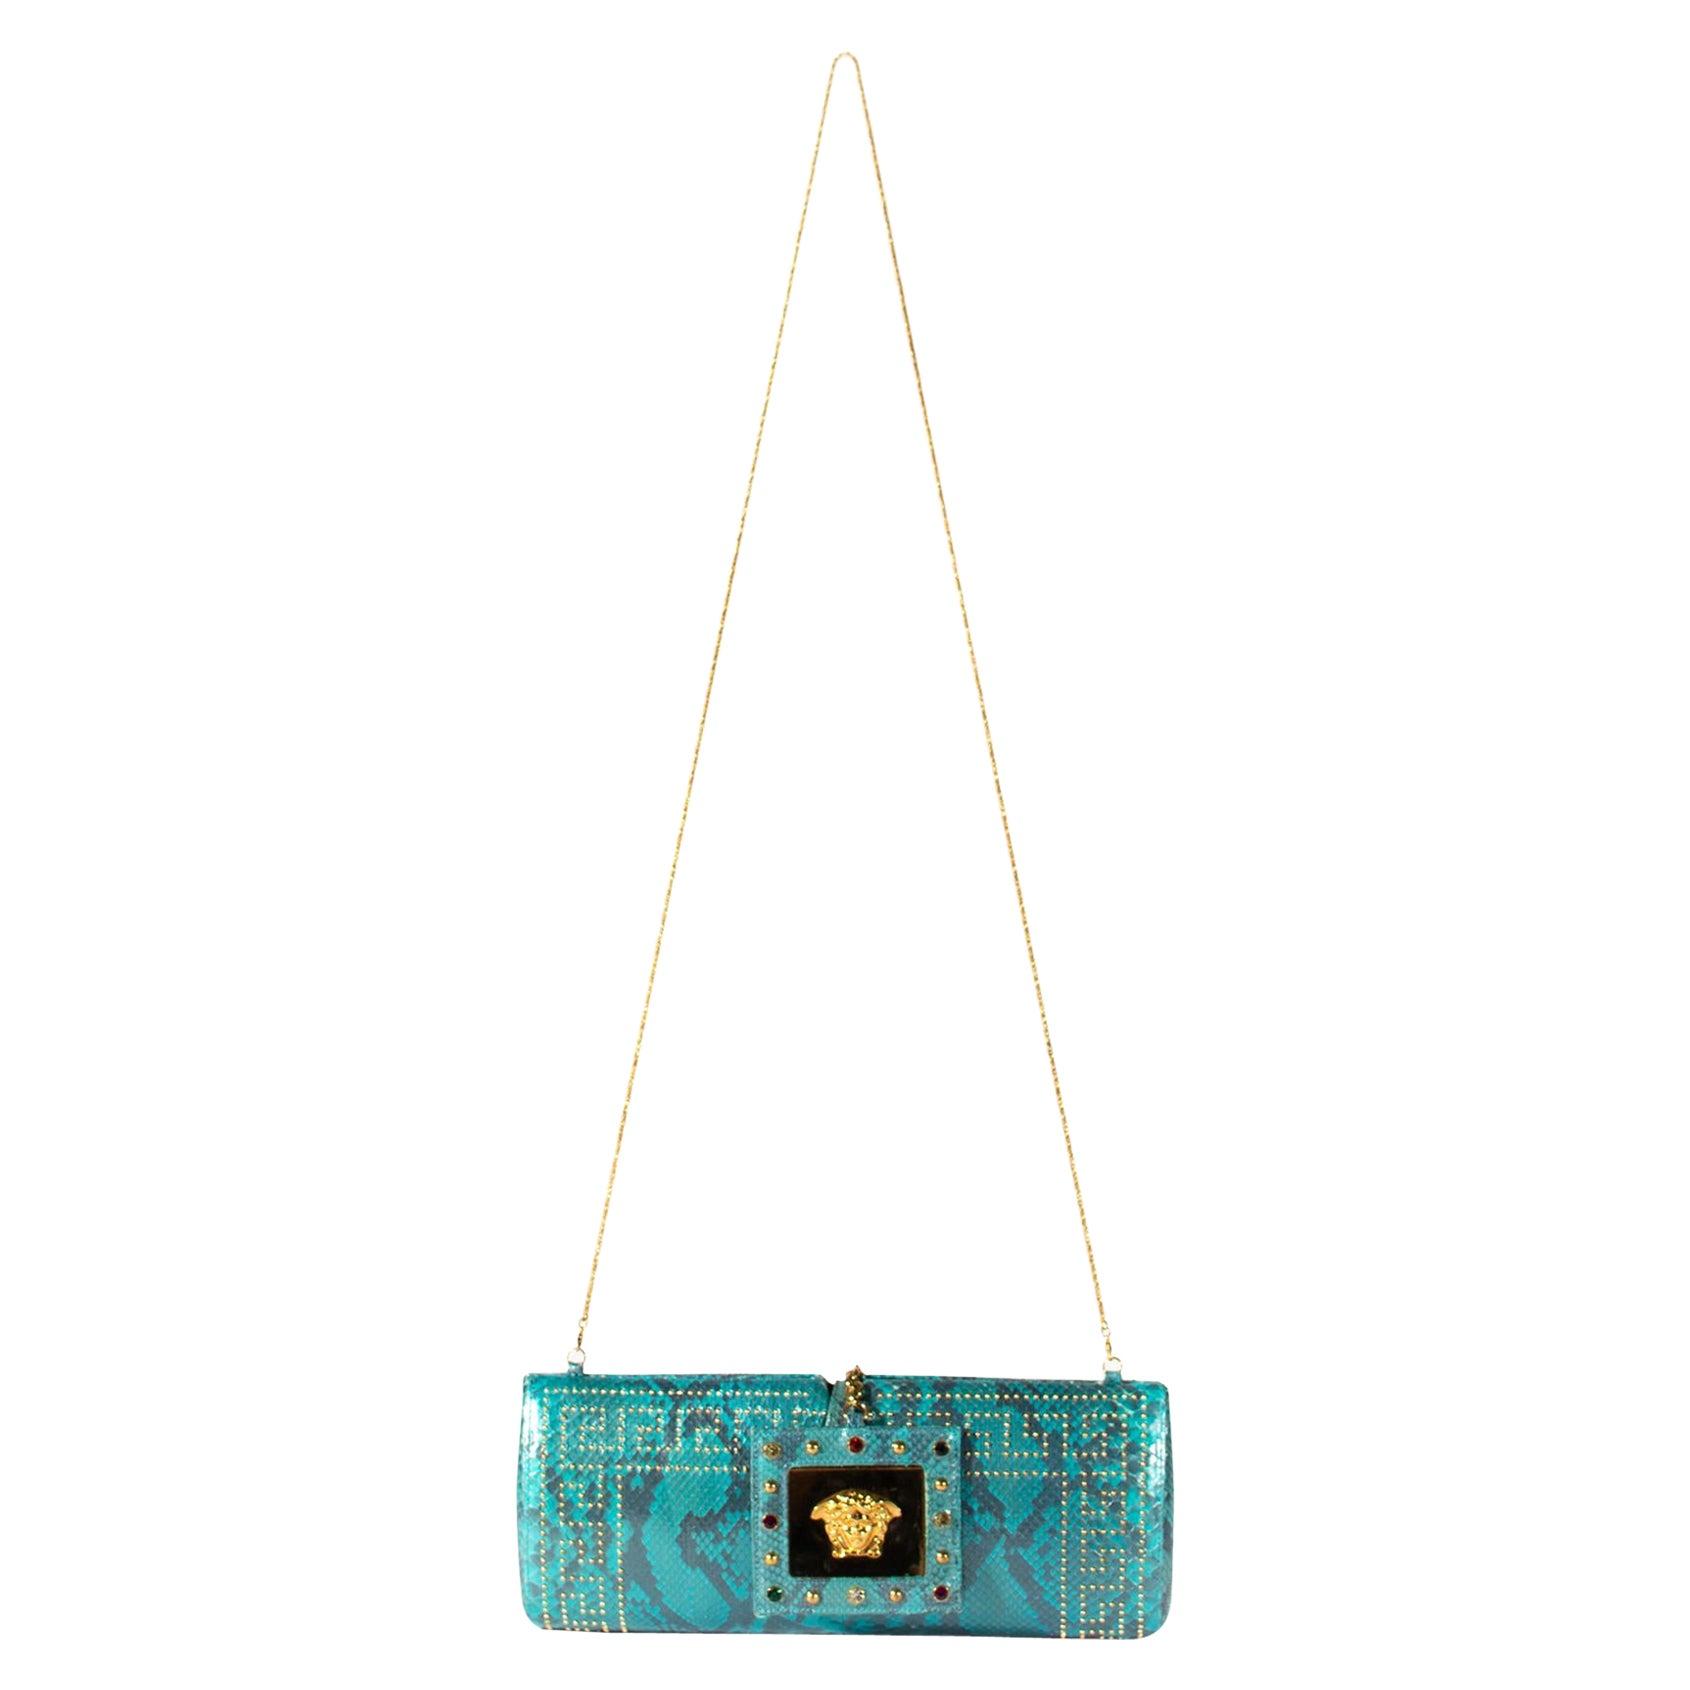 S/S 2000 Gianni Versace Python Blue Convertible Evening Bag & Clutch Donatella